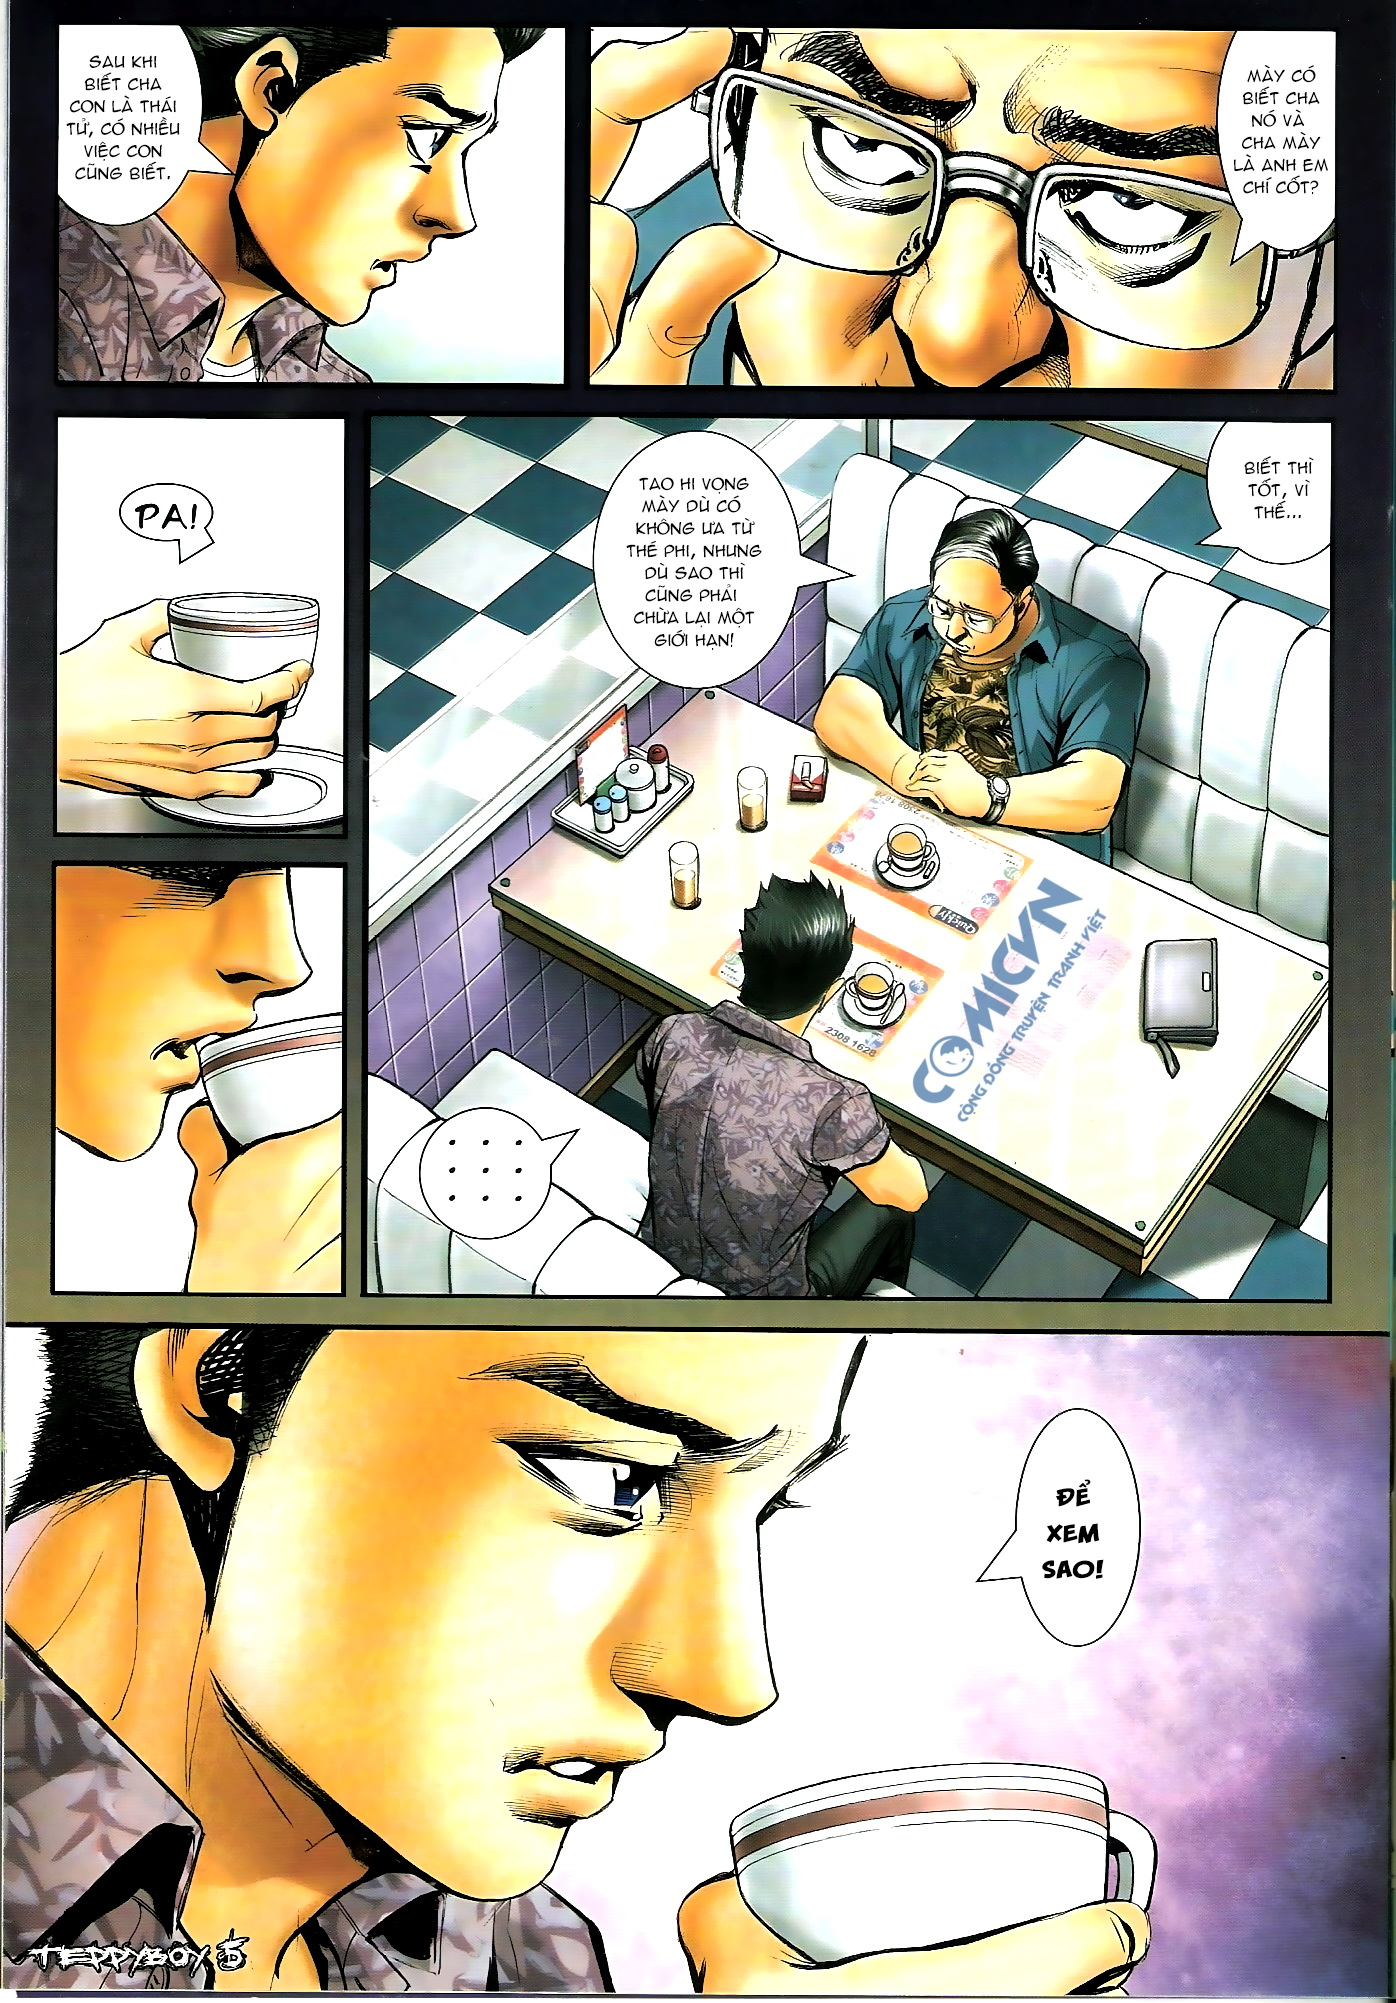 Người Trong Giang Hồ - Chapter 1302: Lịch sử lặp lại - Pic 4